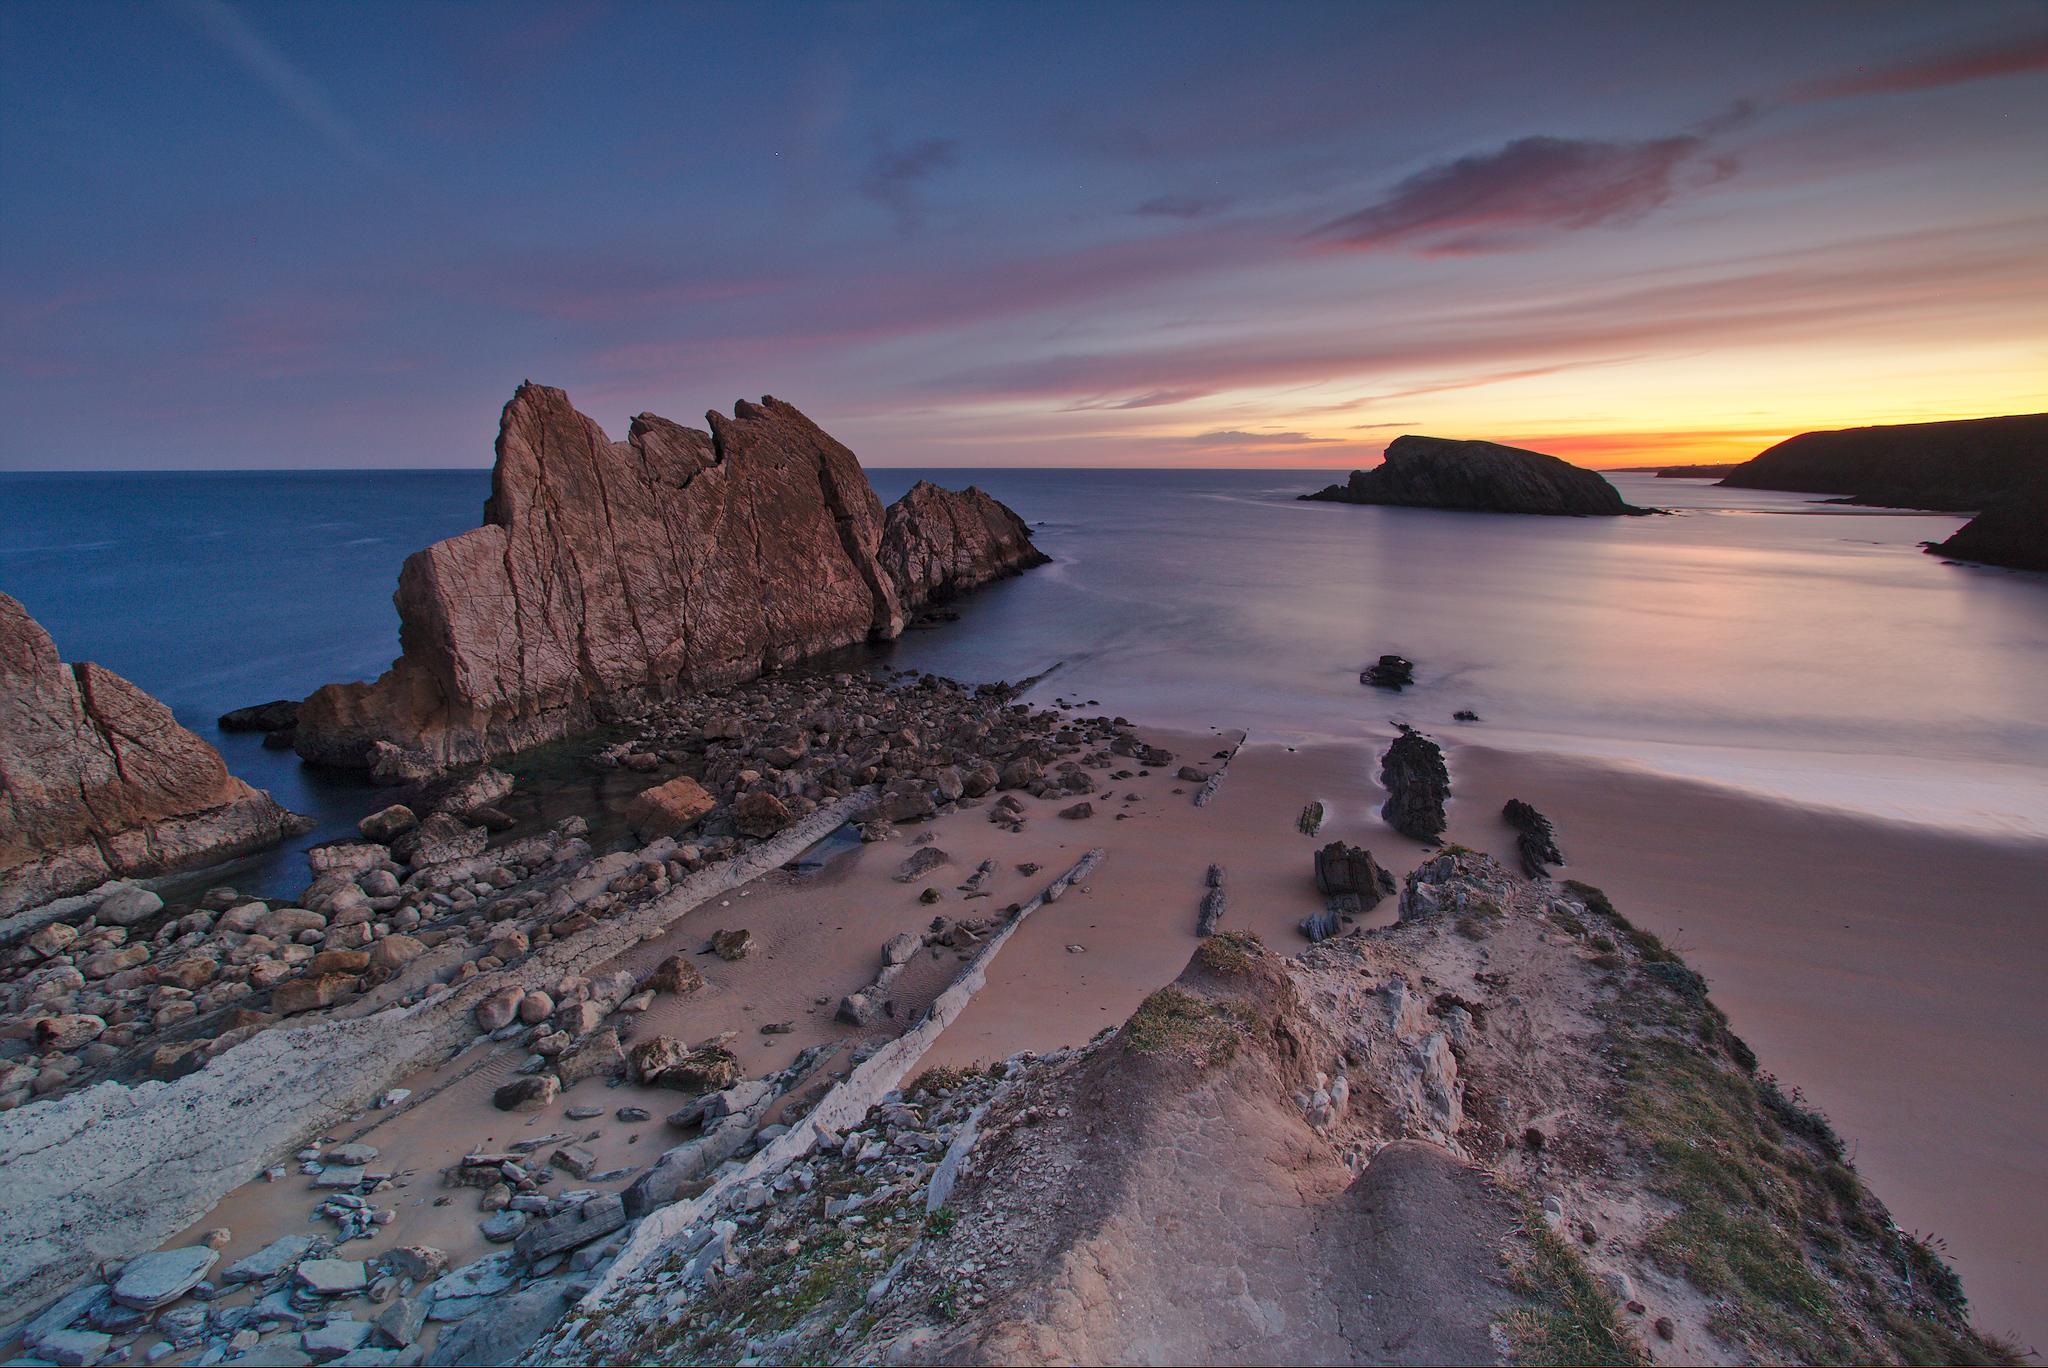 Cantabria, Playa La Arnia, Spain